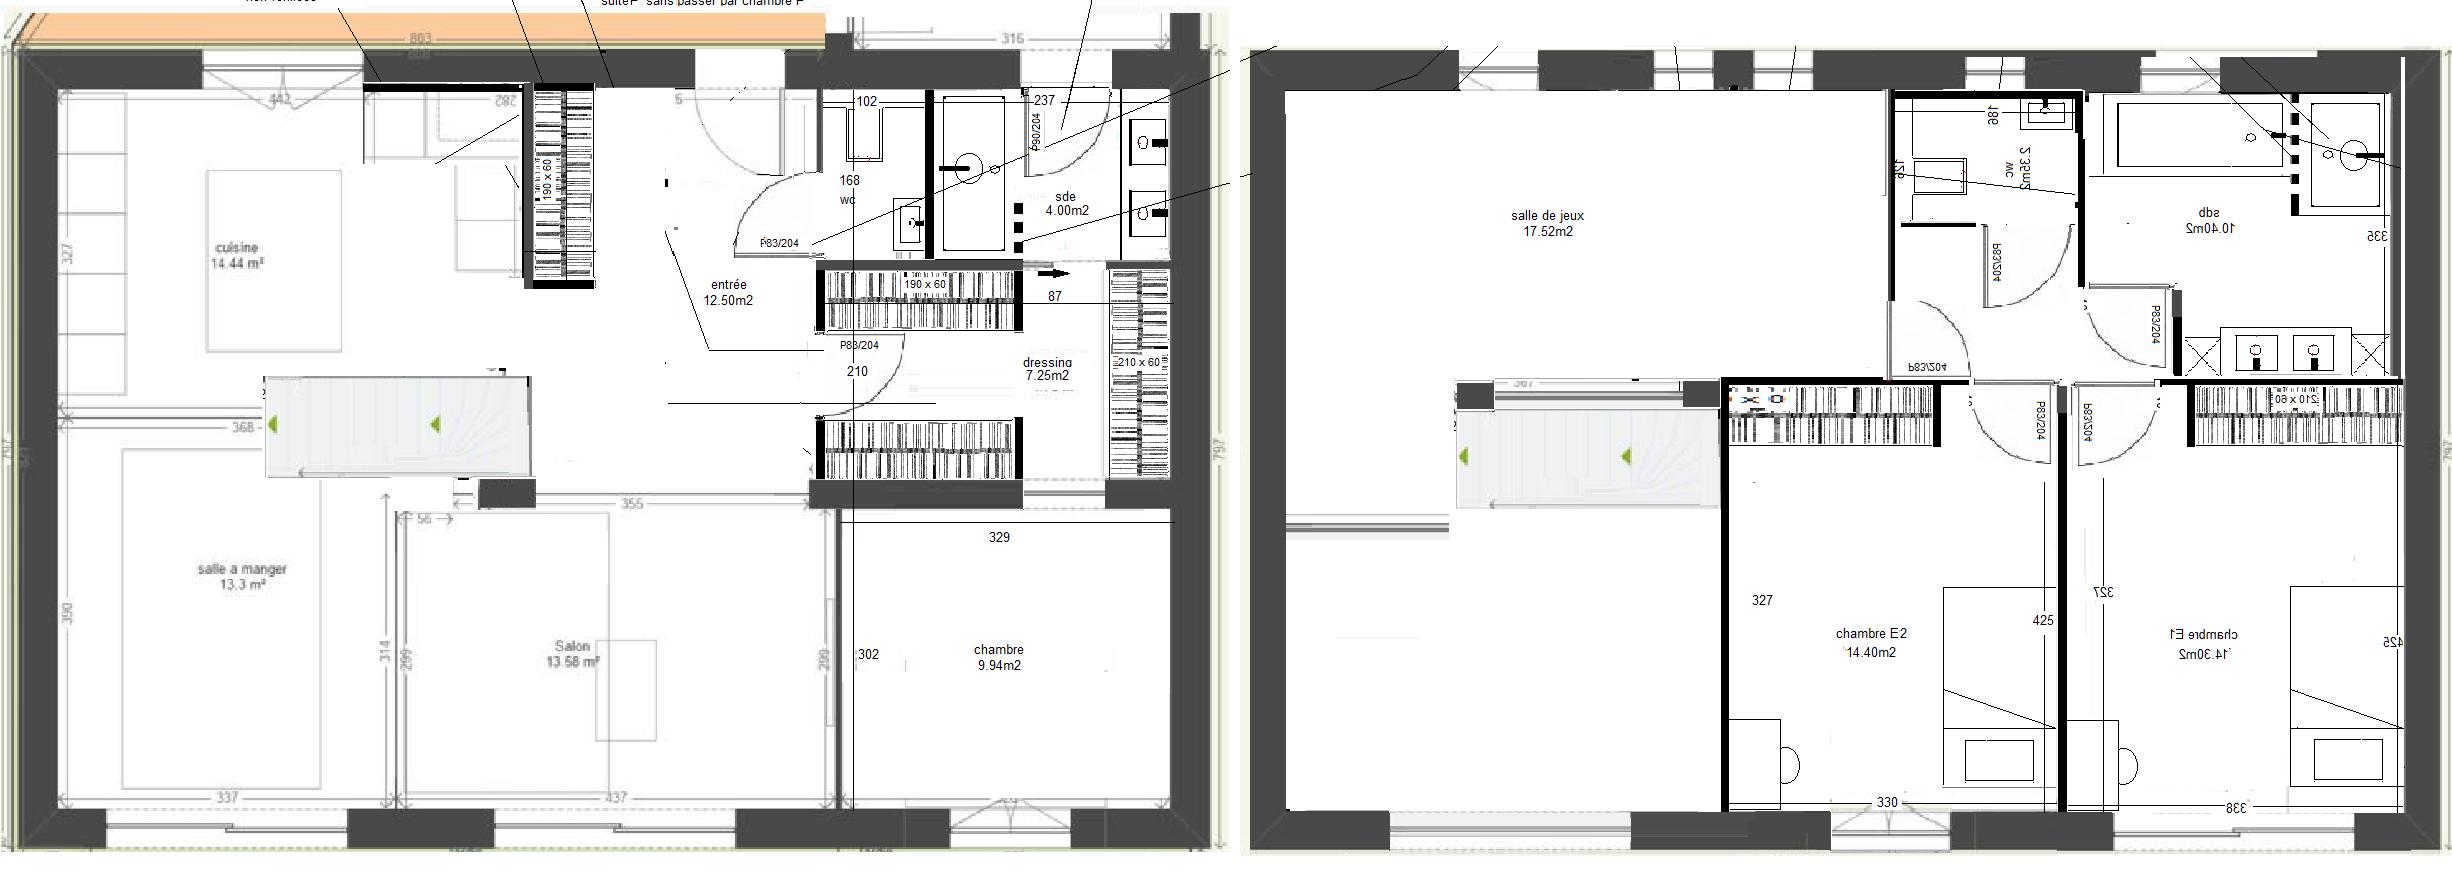 plan maison vide sur sejour. Black Bedroom Furniture Sets. Home Design Ideas